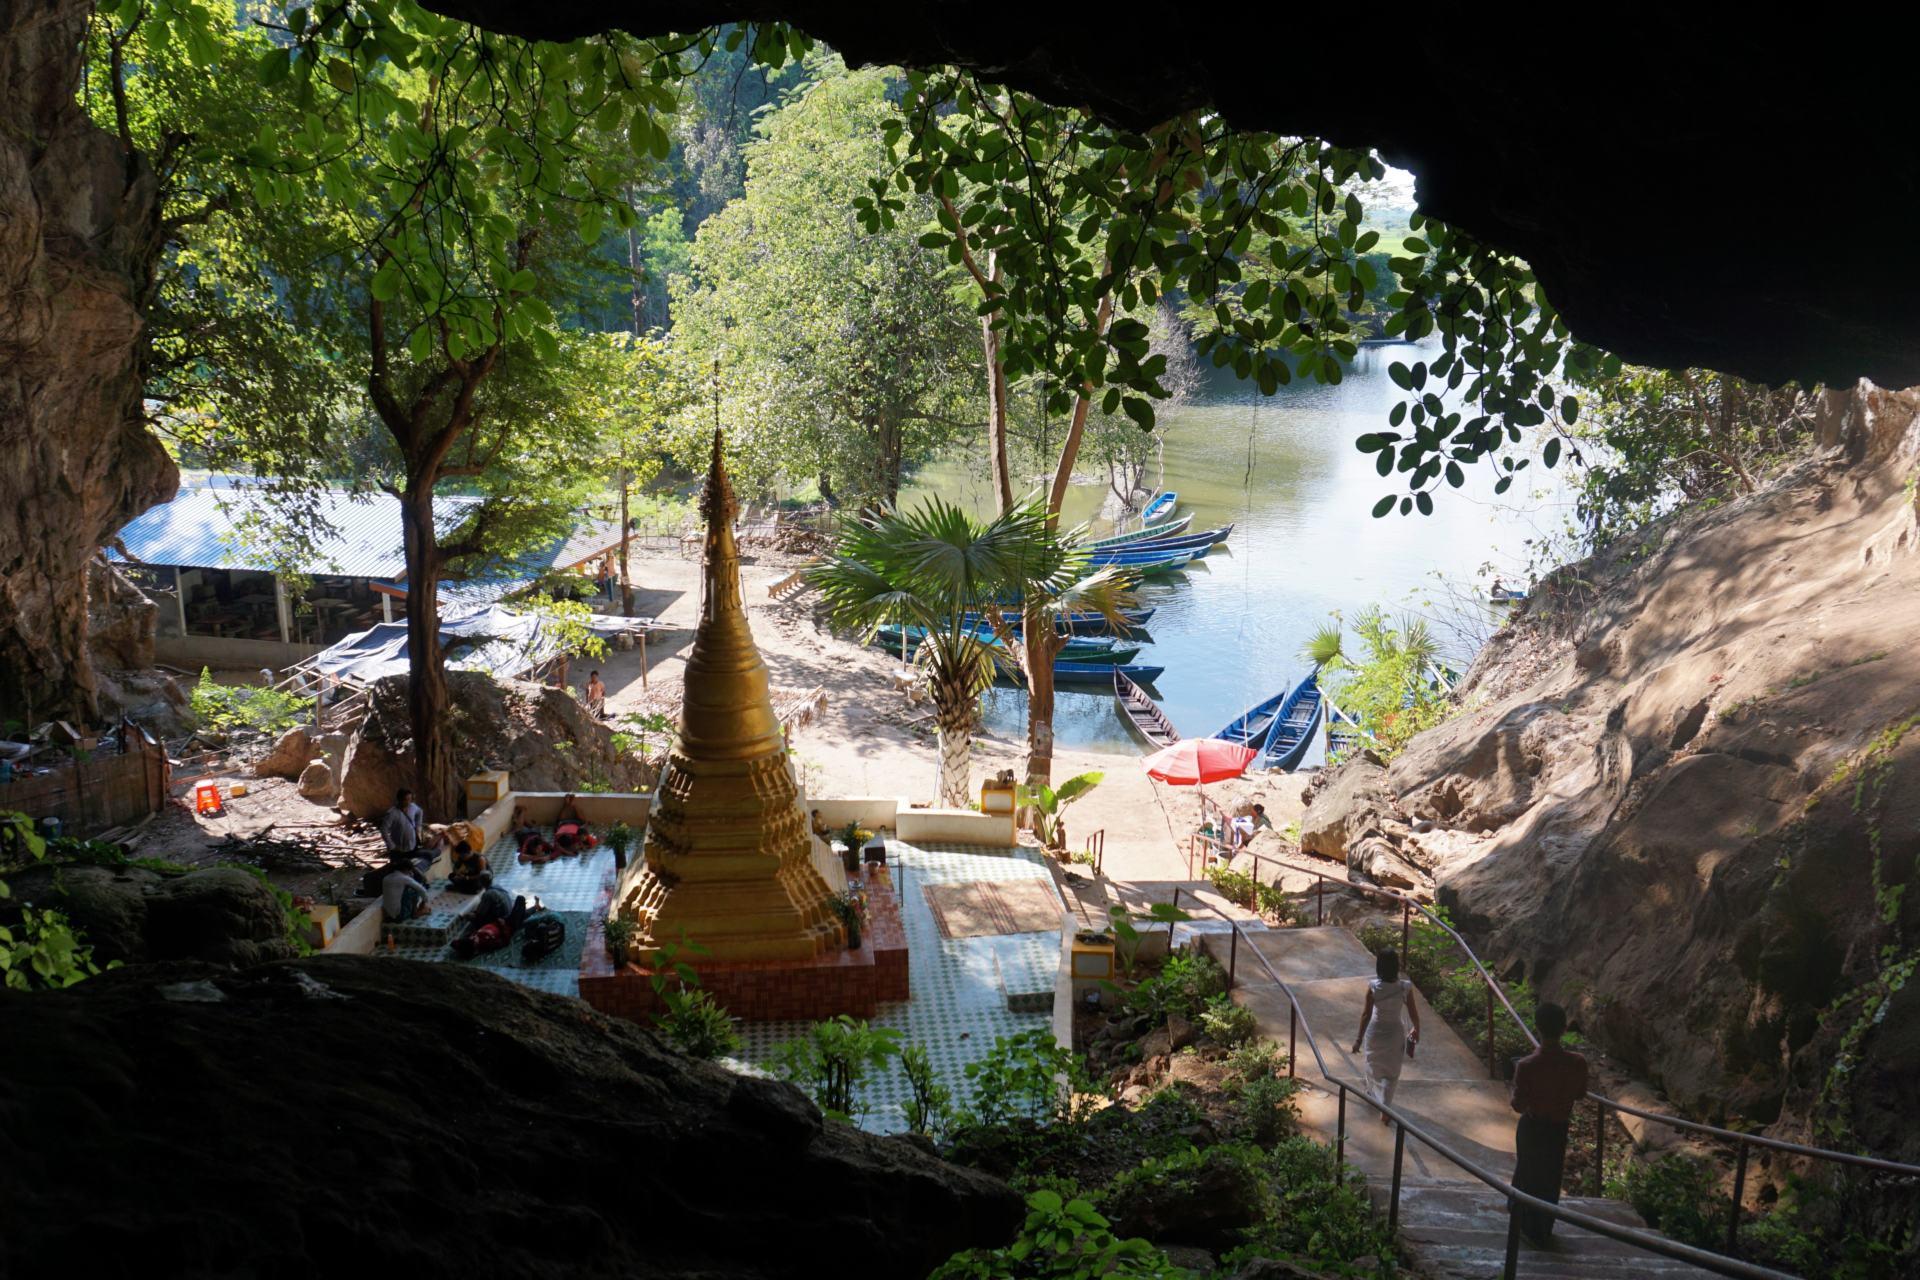 Saddan Höhle-Hpa an-Myanmar